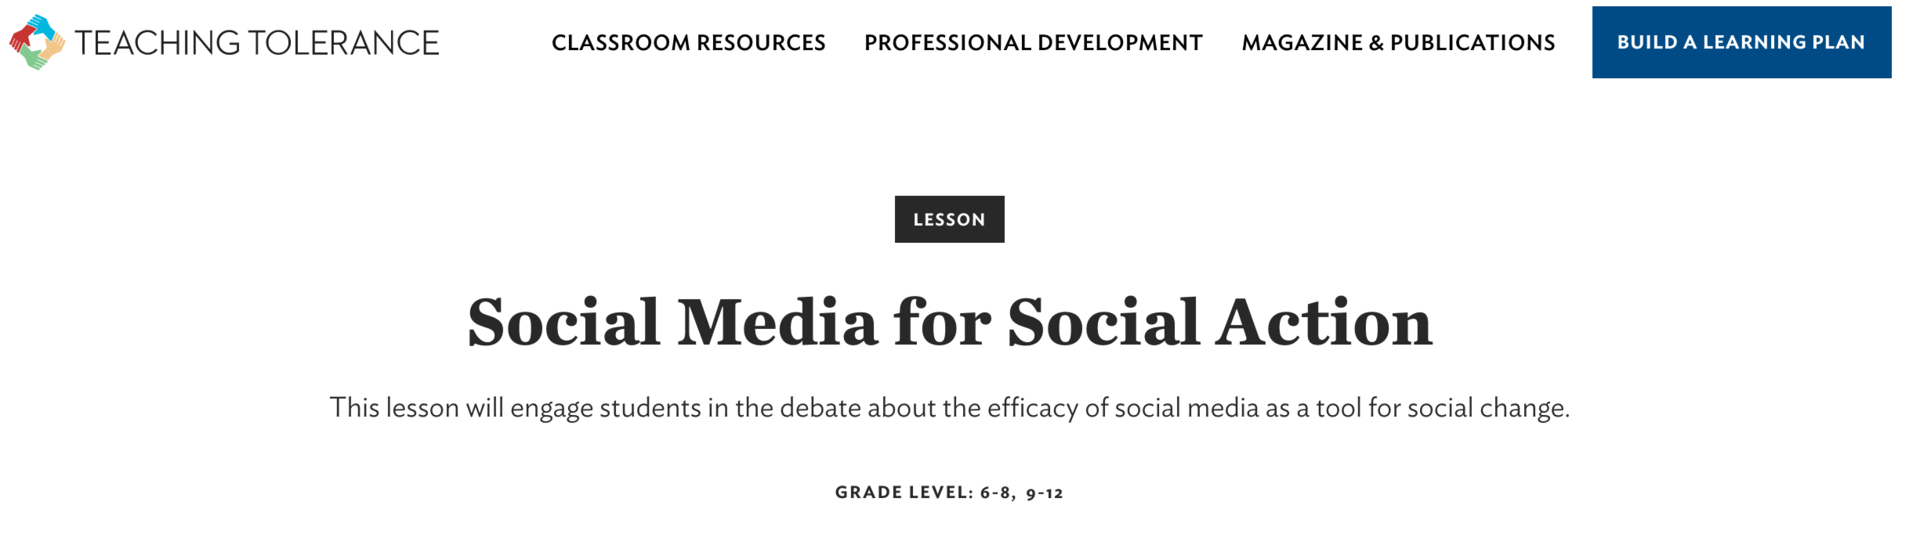 Social Media for Social Action